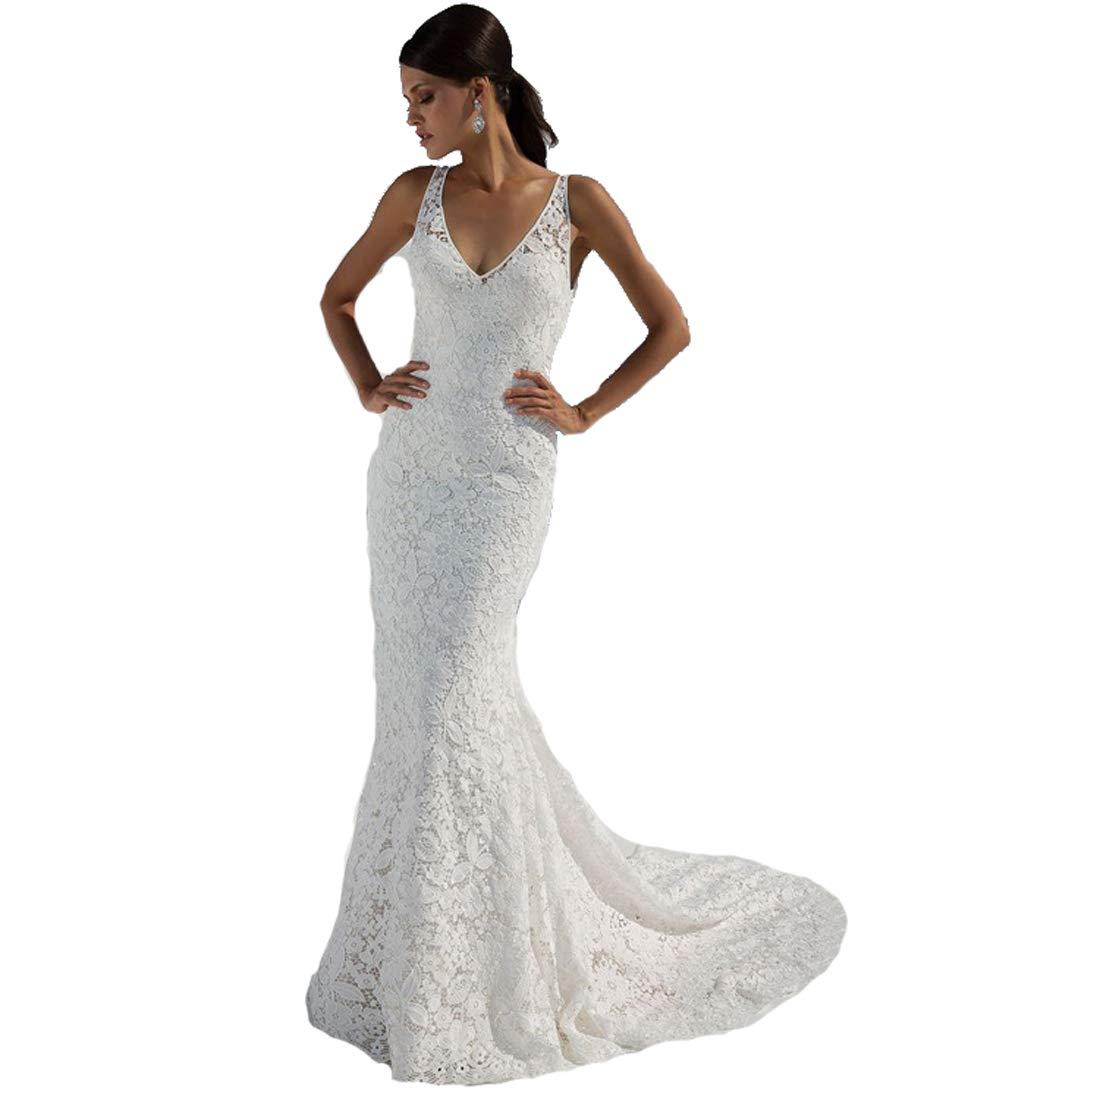 SIQINZHENG Women's Double V-Neck Bridal Gowns Lace Beach Wedding Dress White by SIQINZHENG